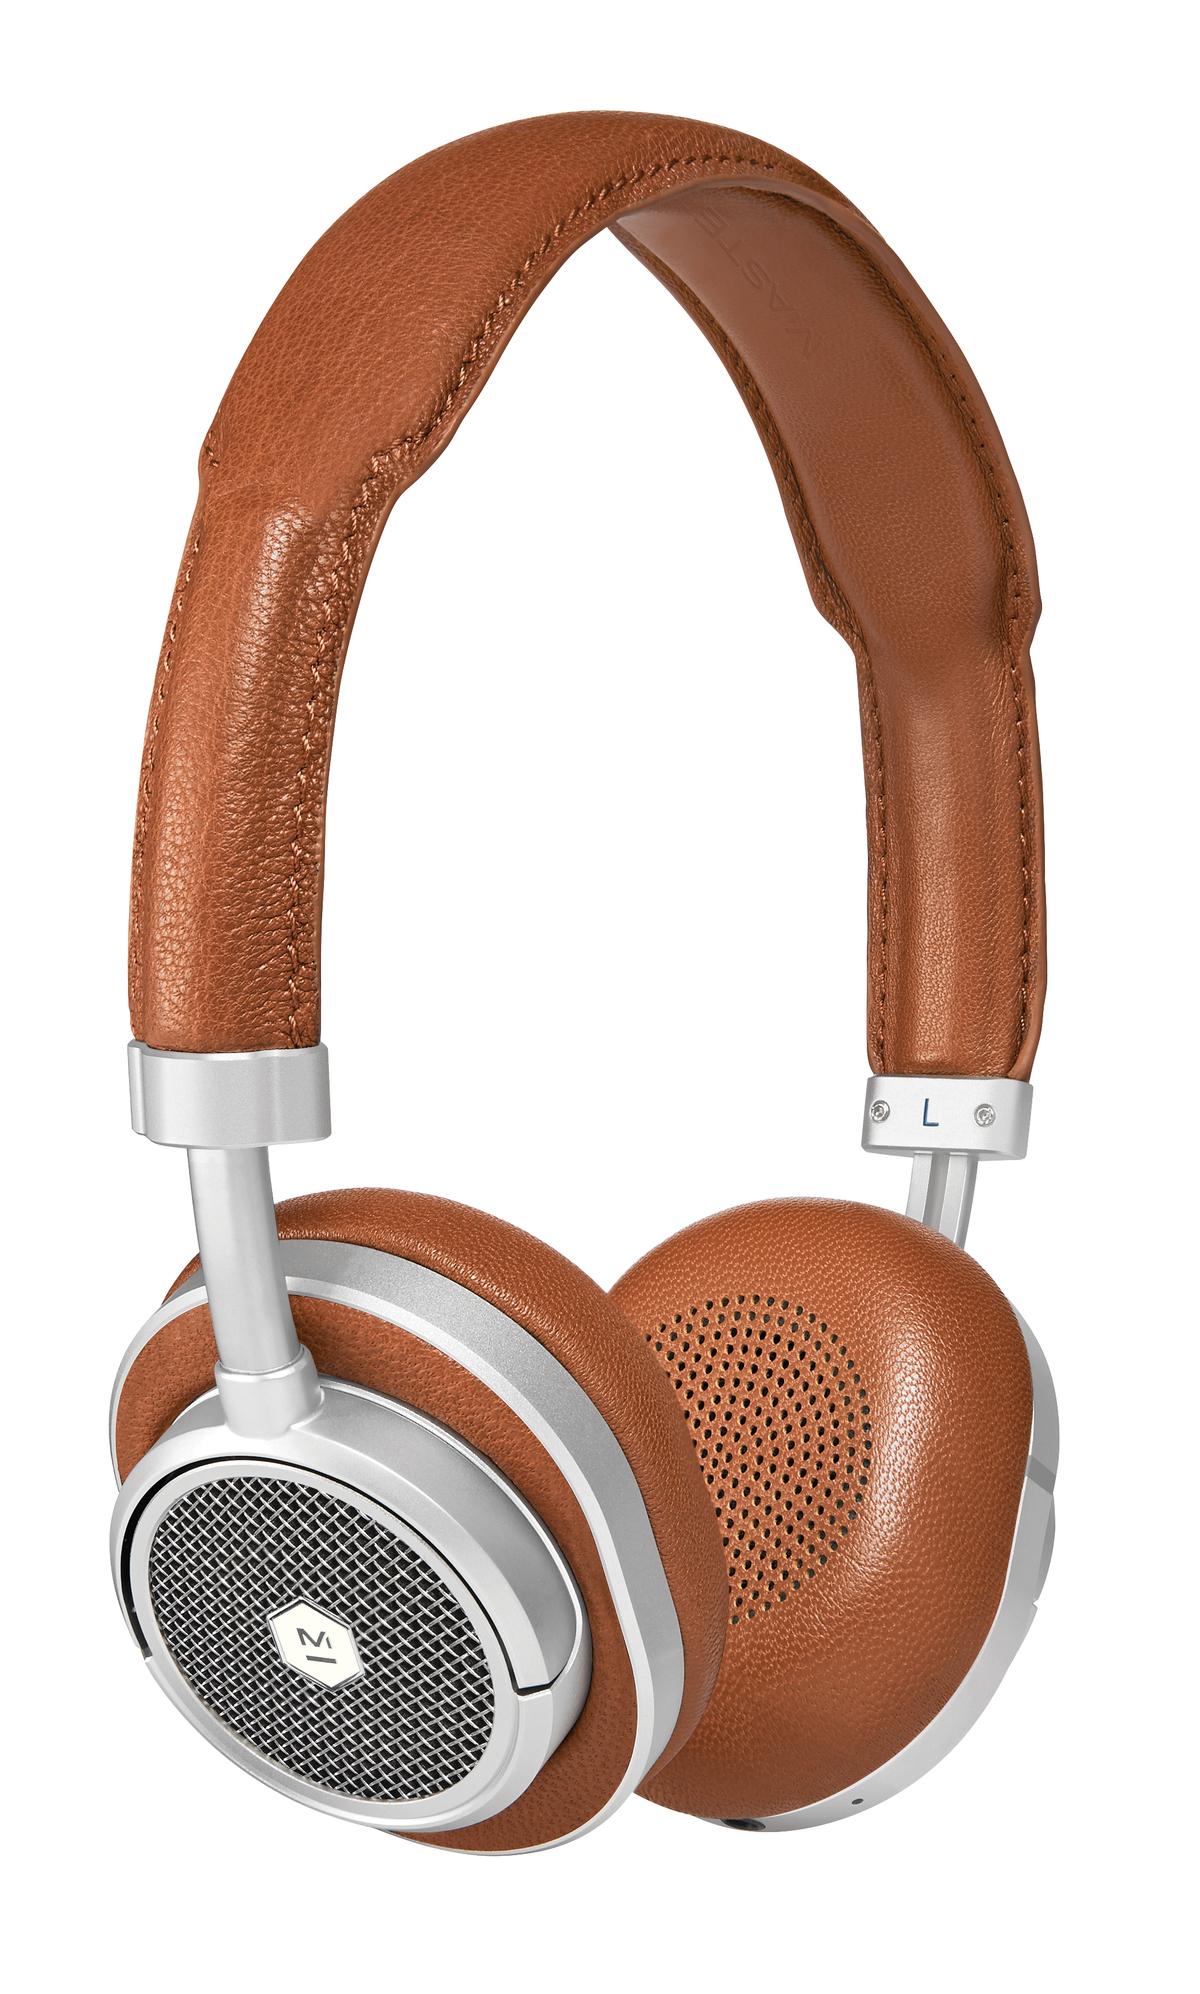 [B-Ware] Master & Dynamic MW50+ Bluetooth-Kopfhörer (wahlweise Over-Ear oder On-Ear, halboffen, BT 4.1, aptX, ~16h Akku, USB-C, Echtleder)